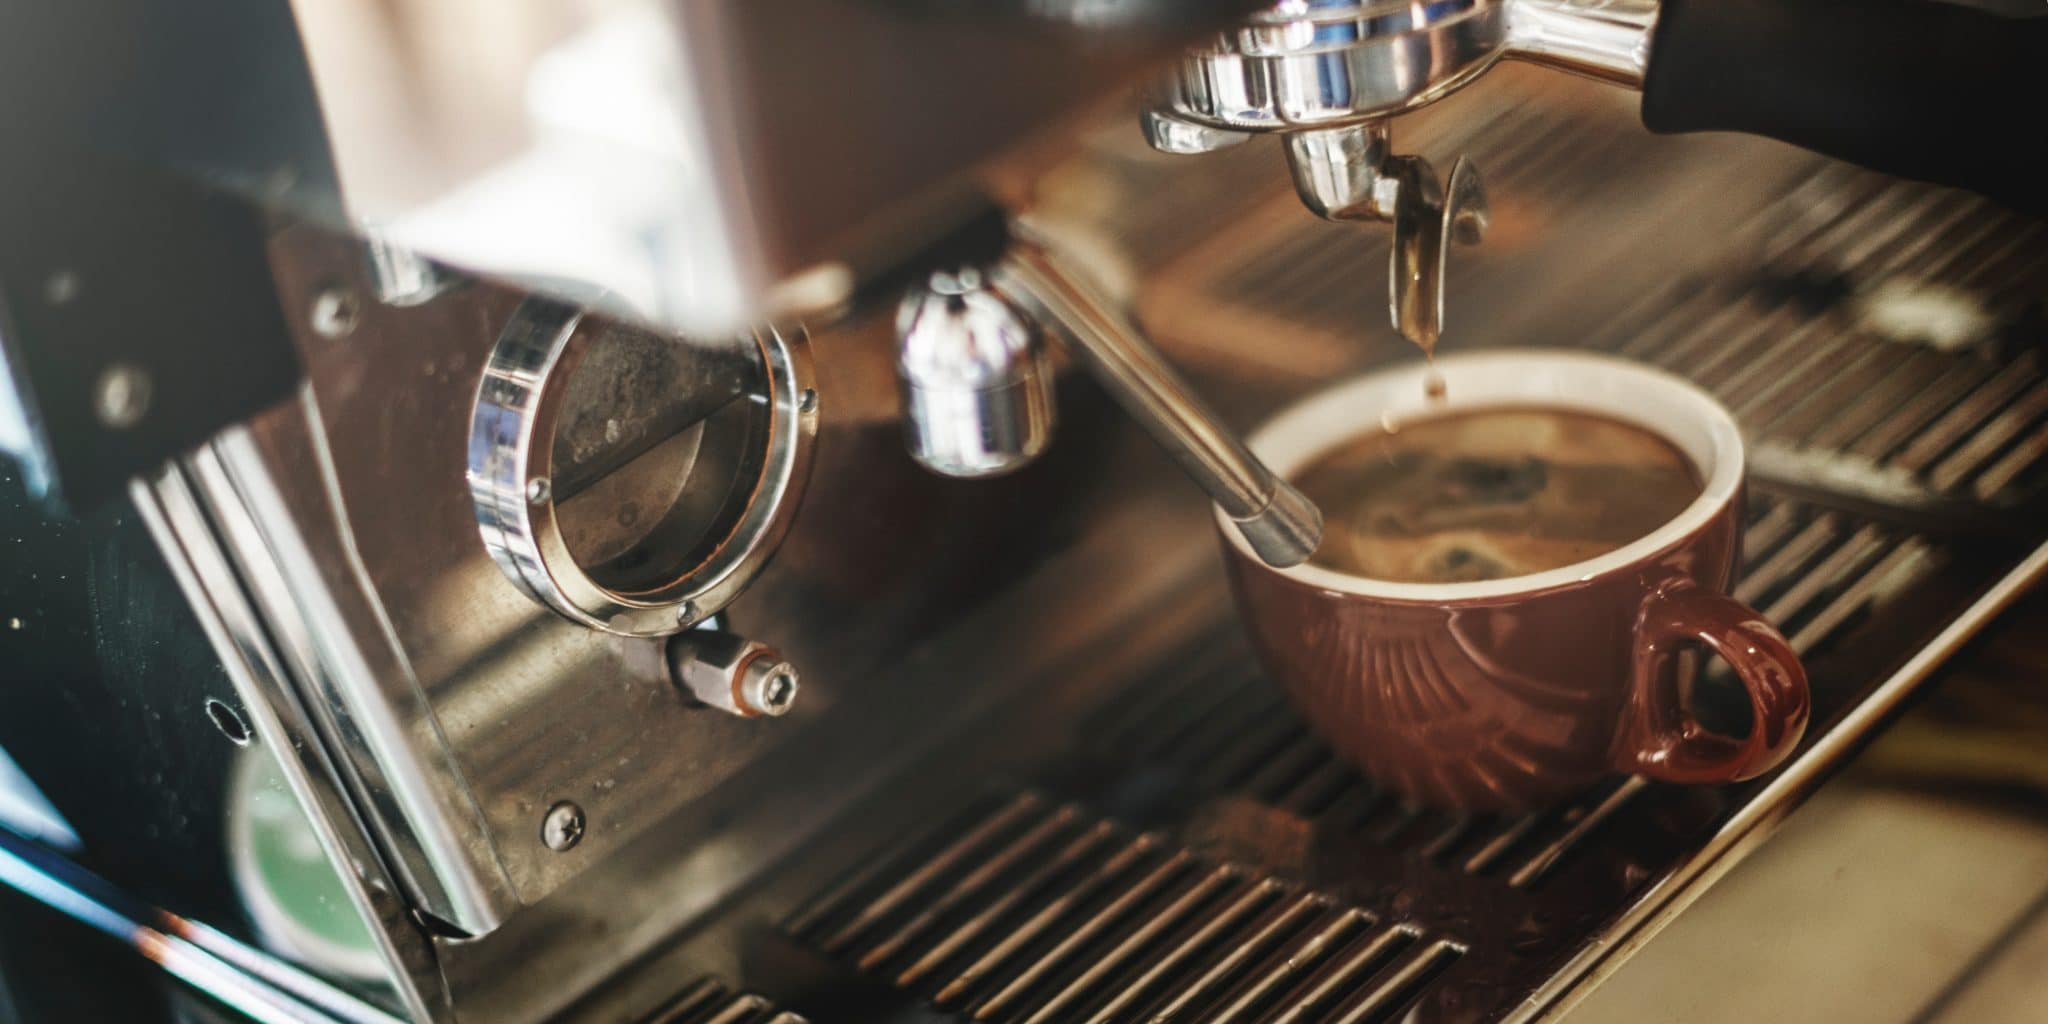 coffee machine, coffee table setting